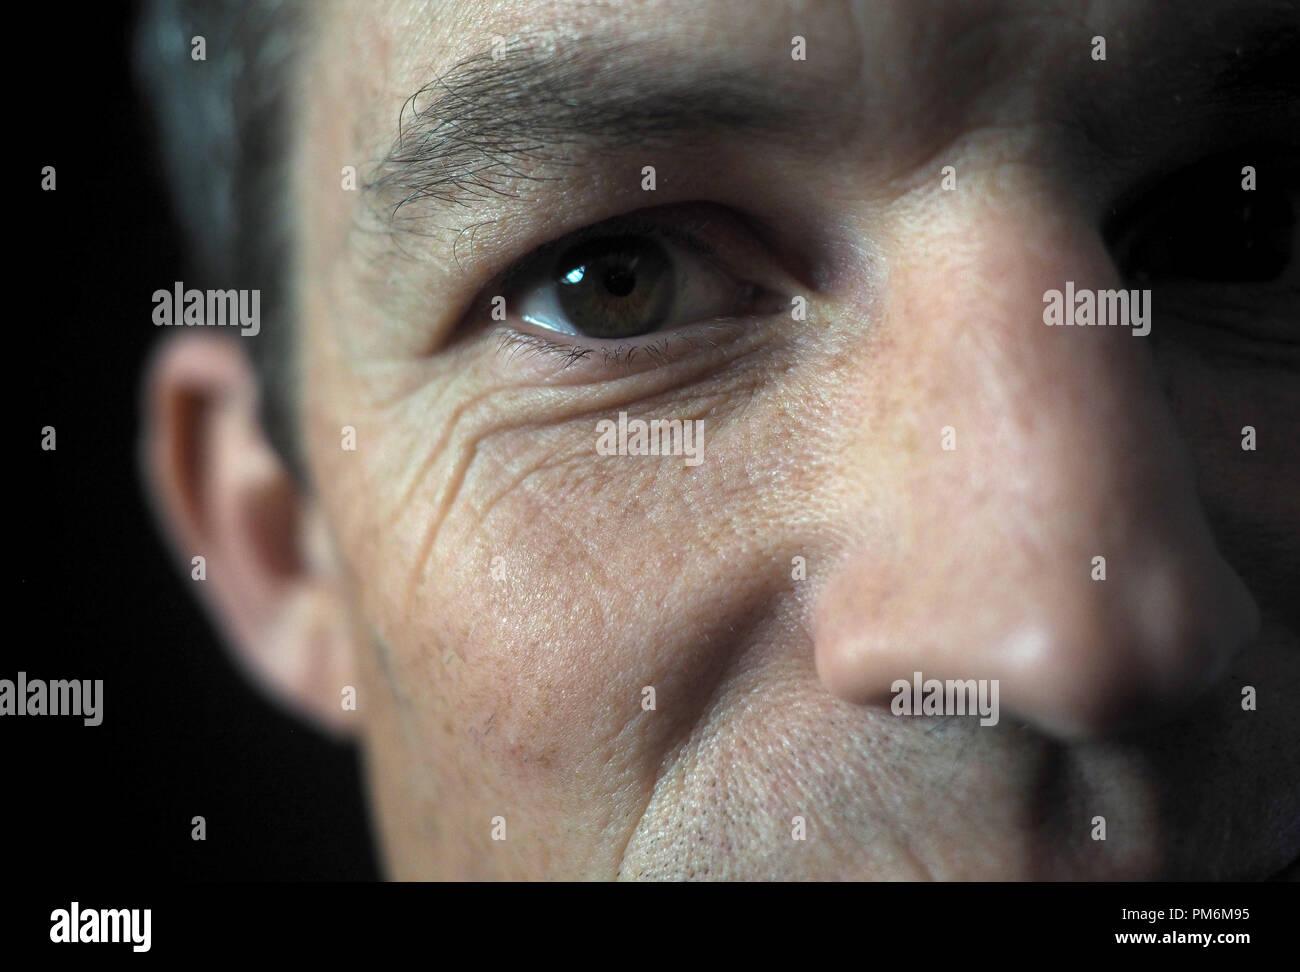 Portrait of man on black background, close up on eye Stock Photo